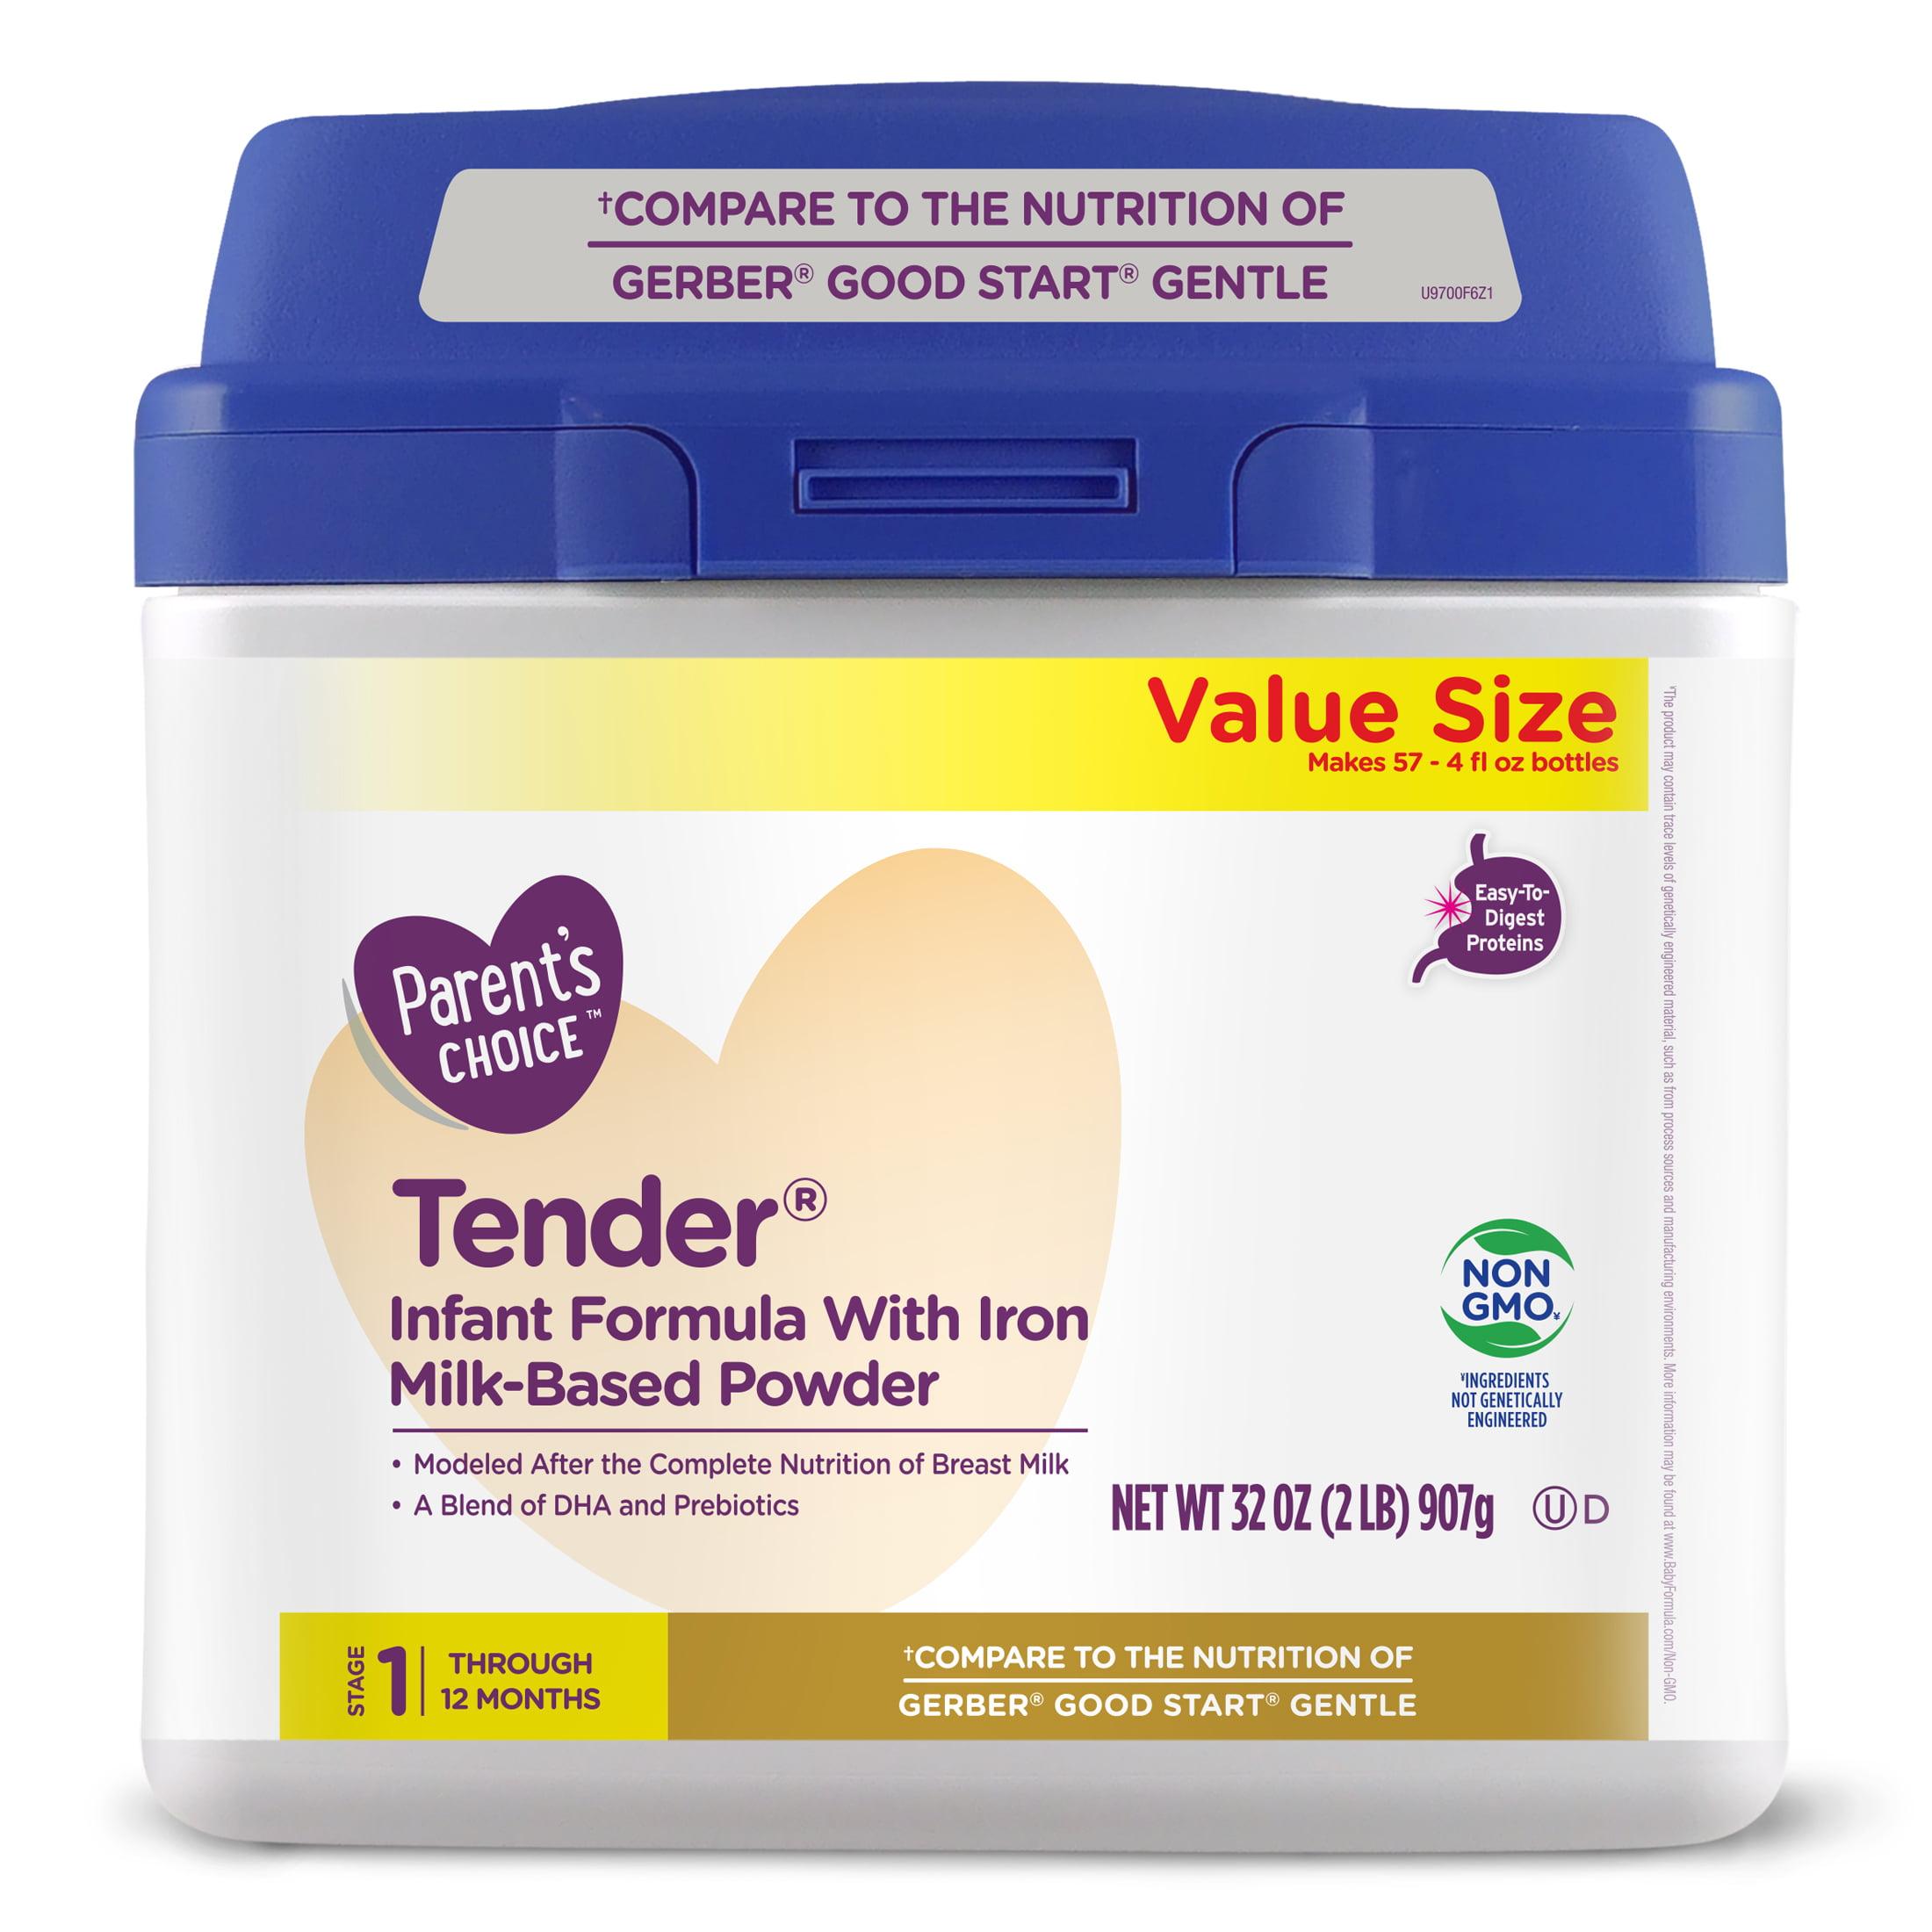 Parent's Choice Tender Infant Formula with Iron, Powder, 32 oz